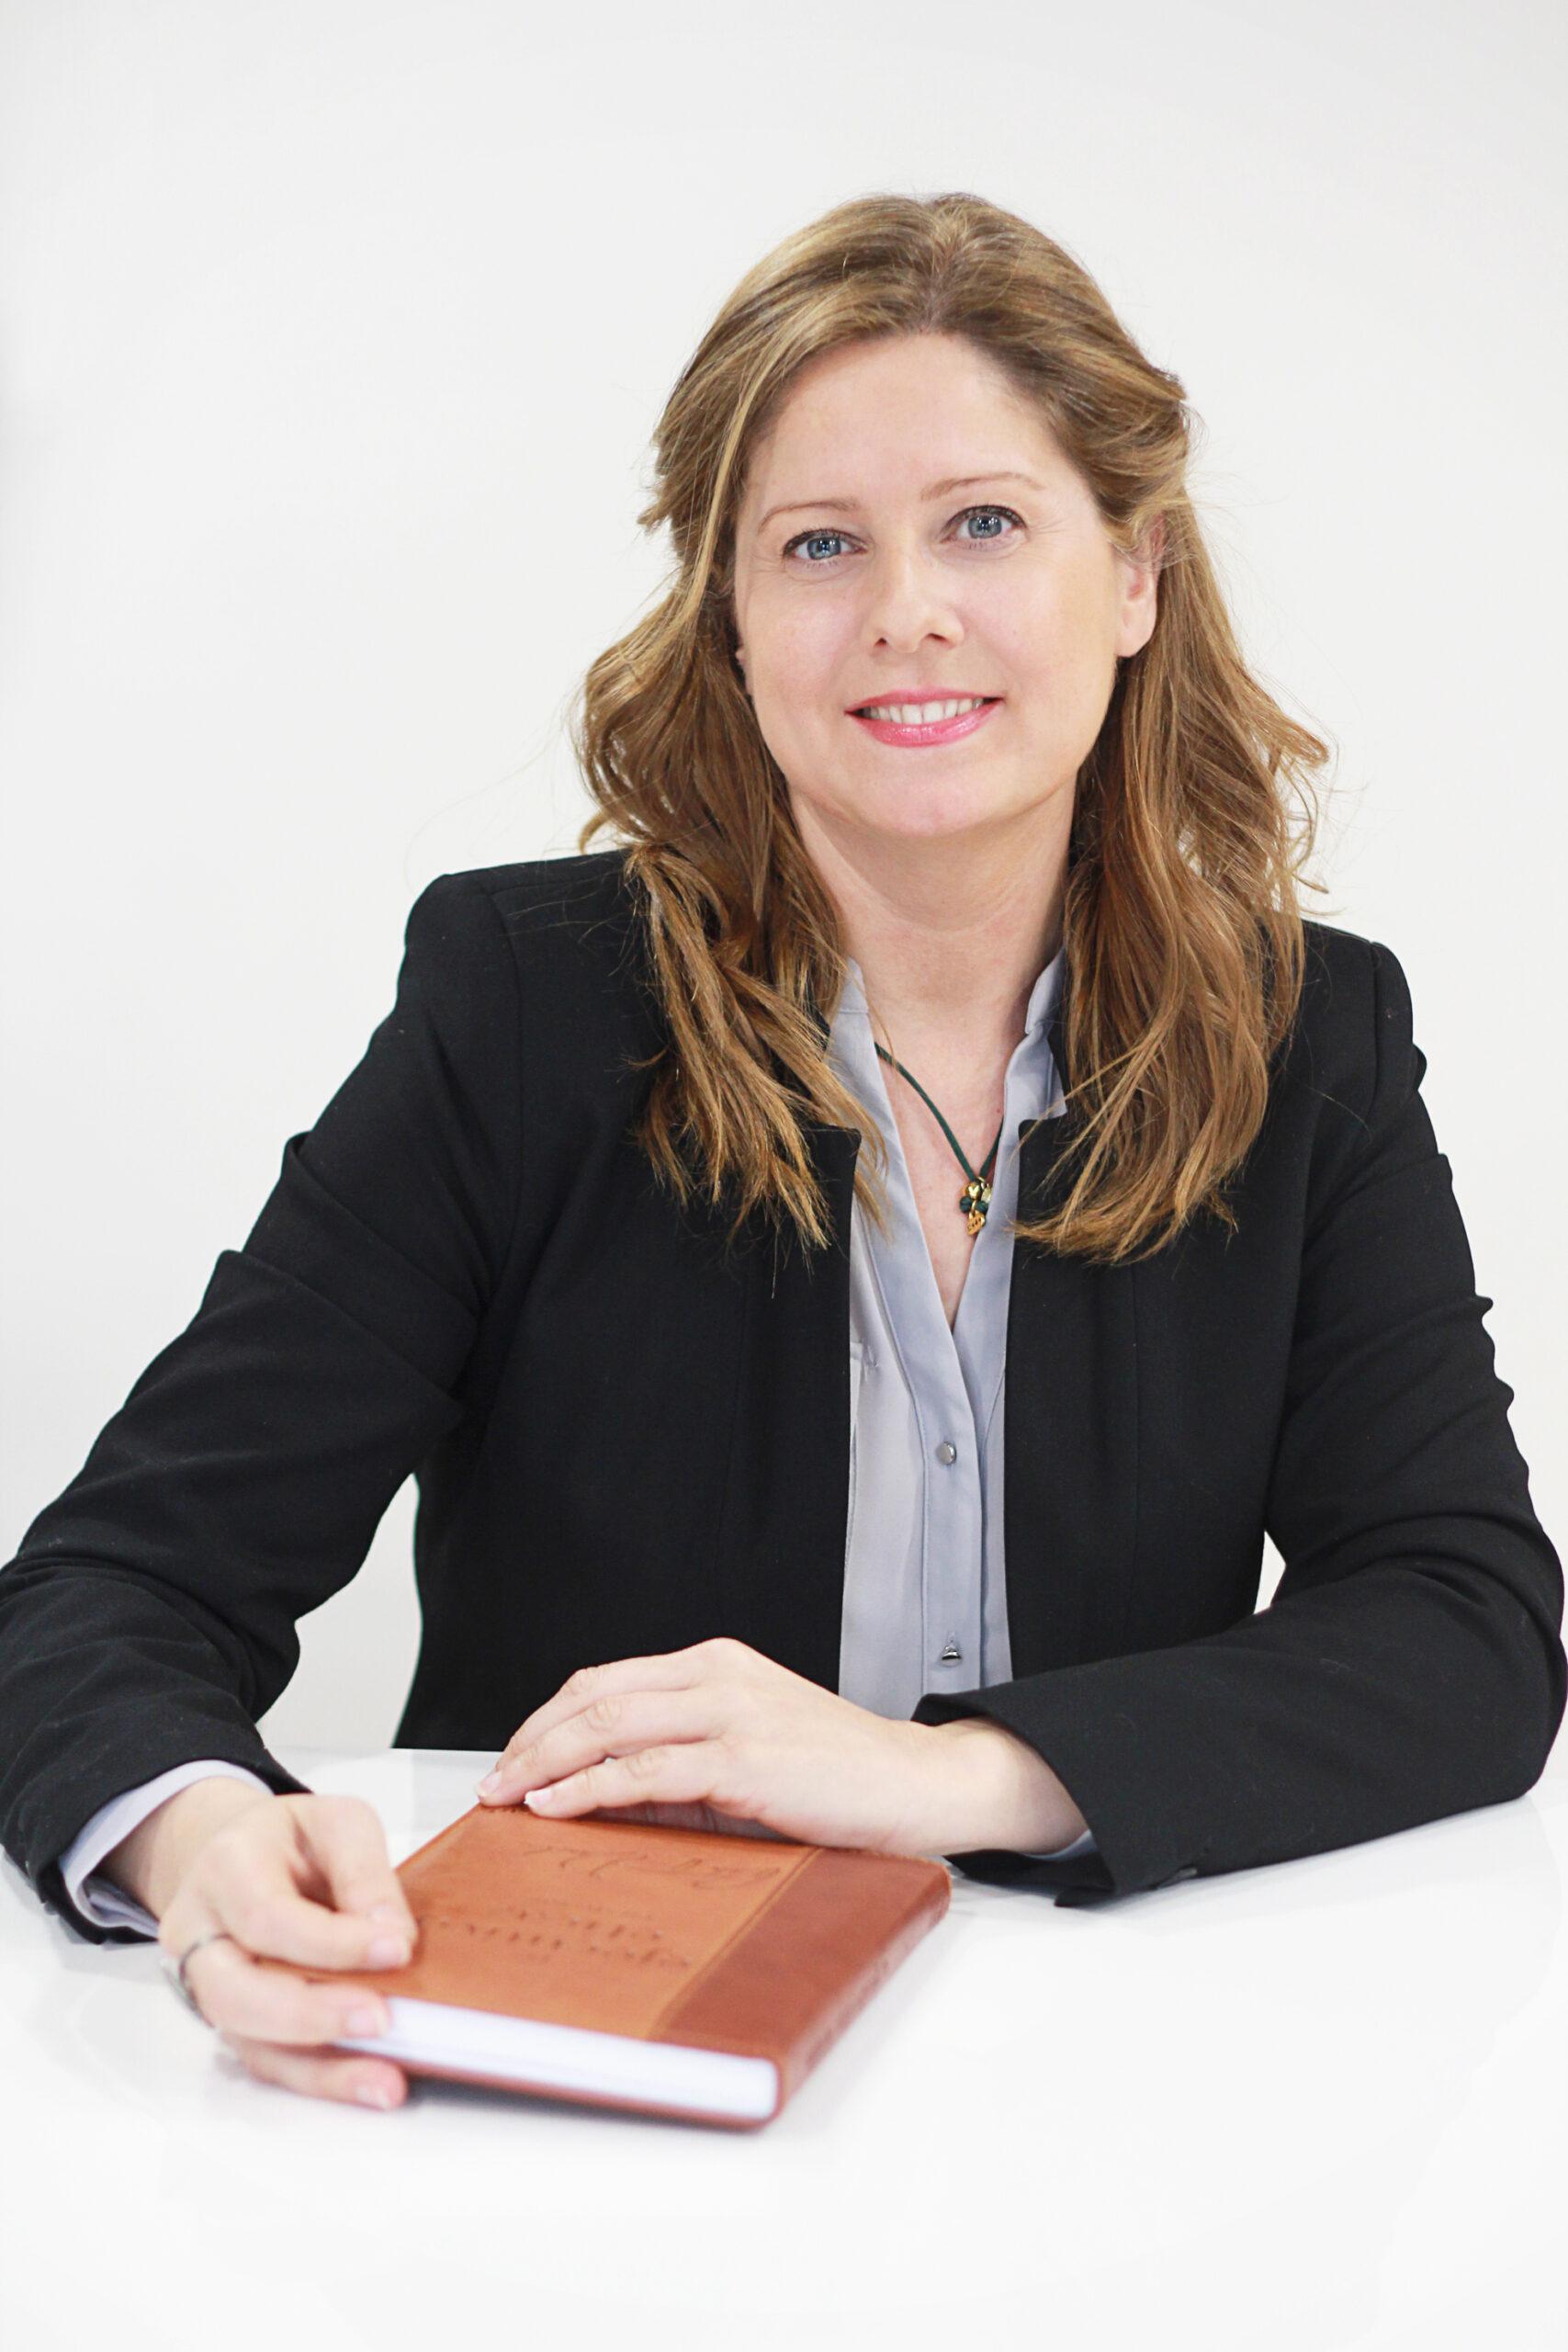 https://creamasaccion.es/wp-content/uploads/2021/06/Cristina-Arca-scaled.jpg